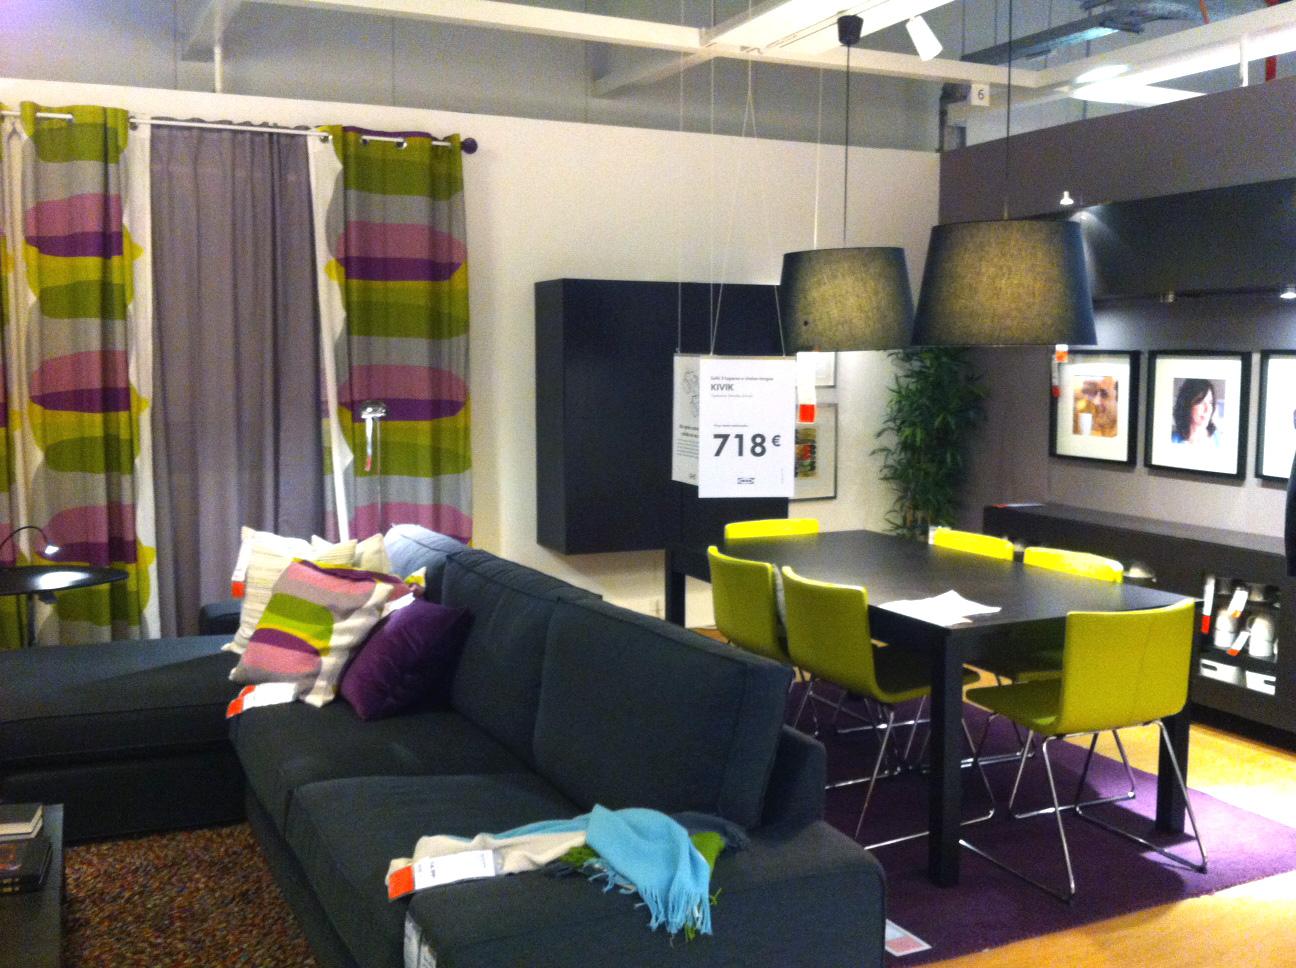 Decoracao Sala De Estar Ikea ~  no facebook compartilhar com o pinterest marcadores ikea sala sala de